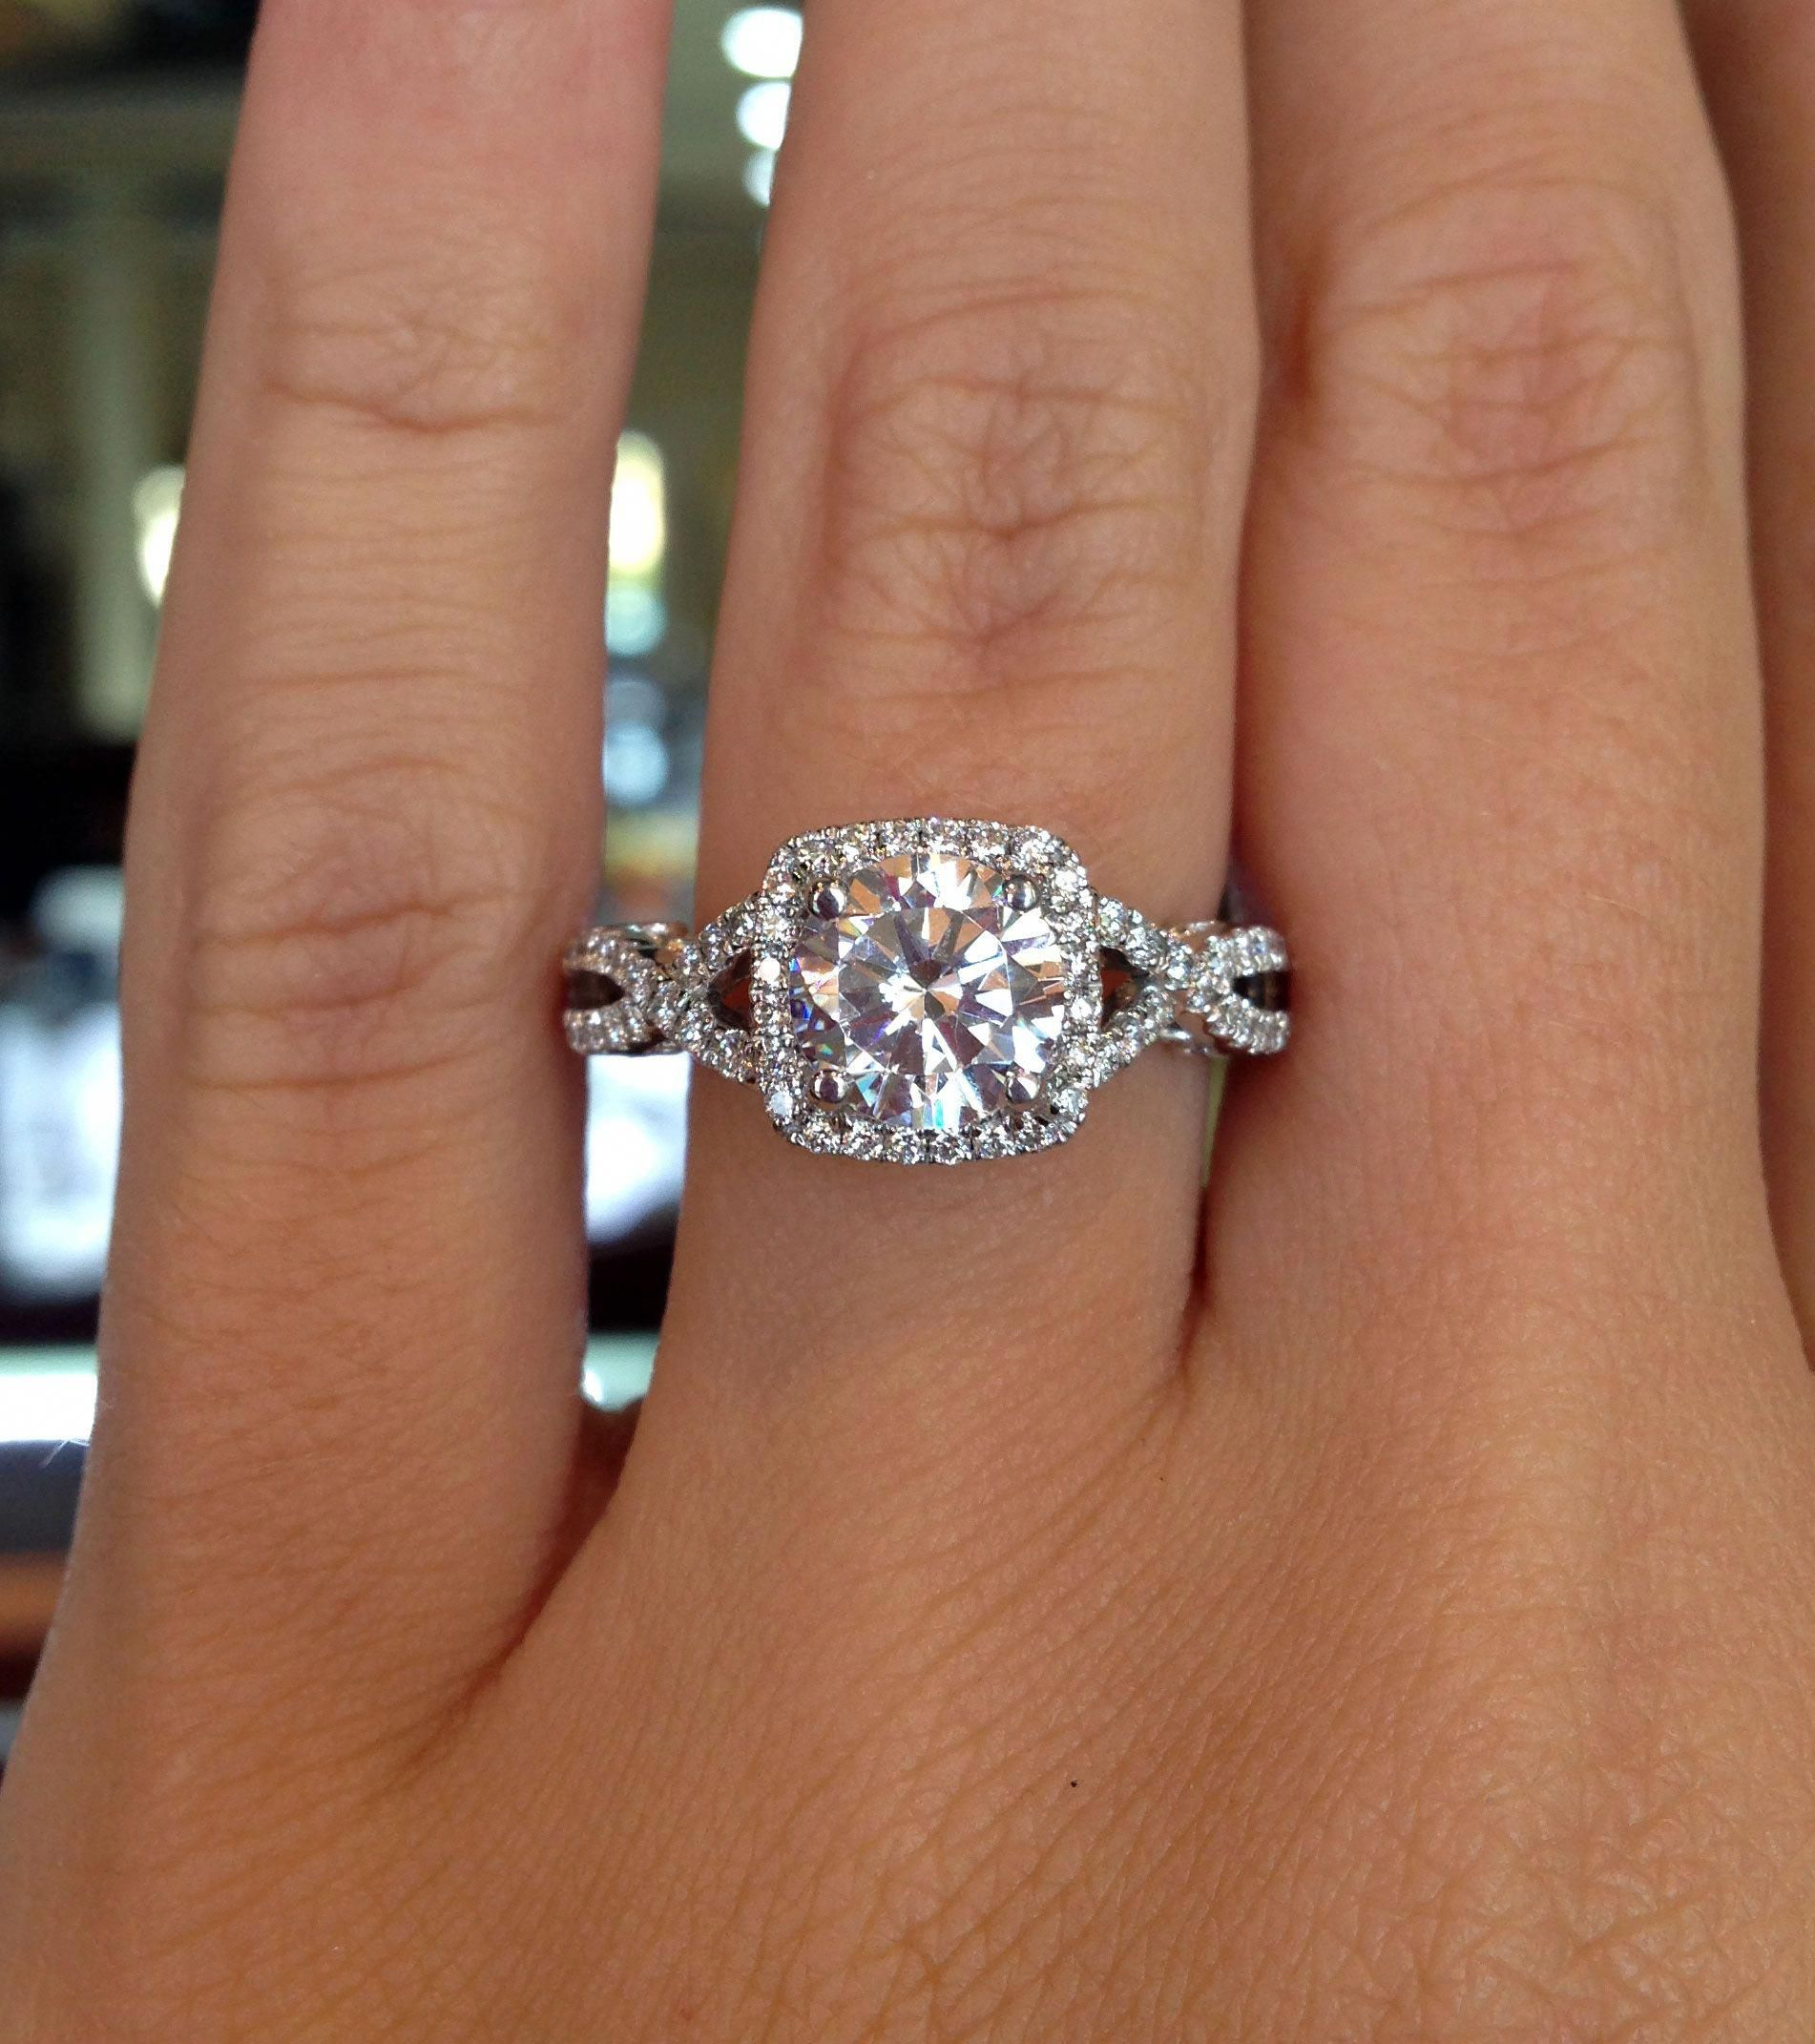 Verragio inscugold diamond engagement ring dream ring cushion